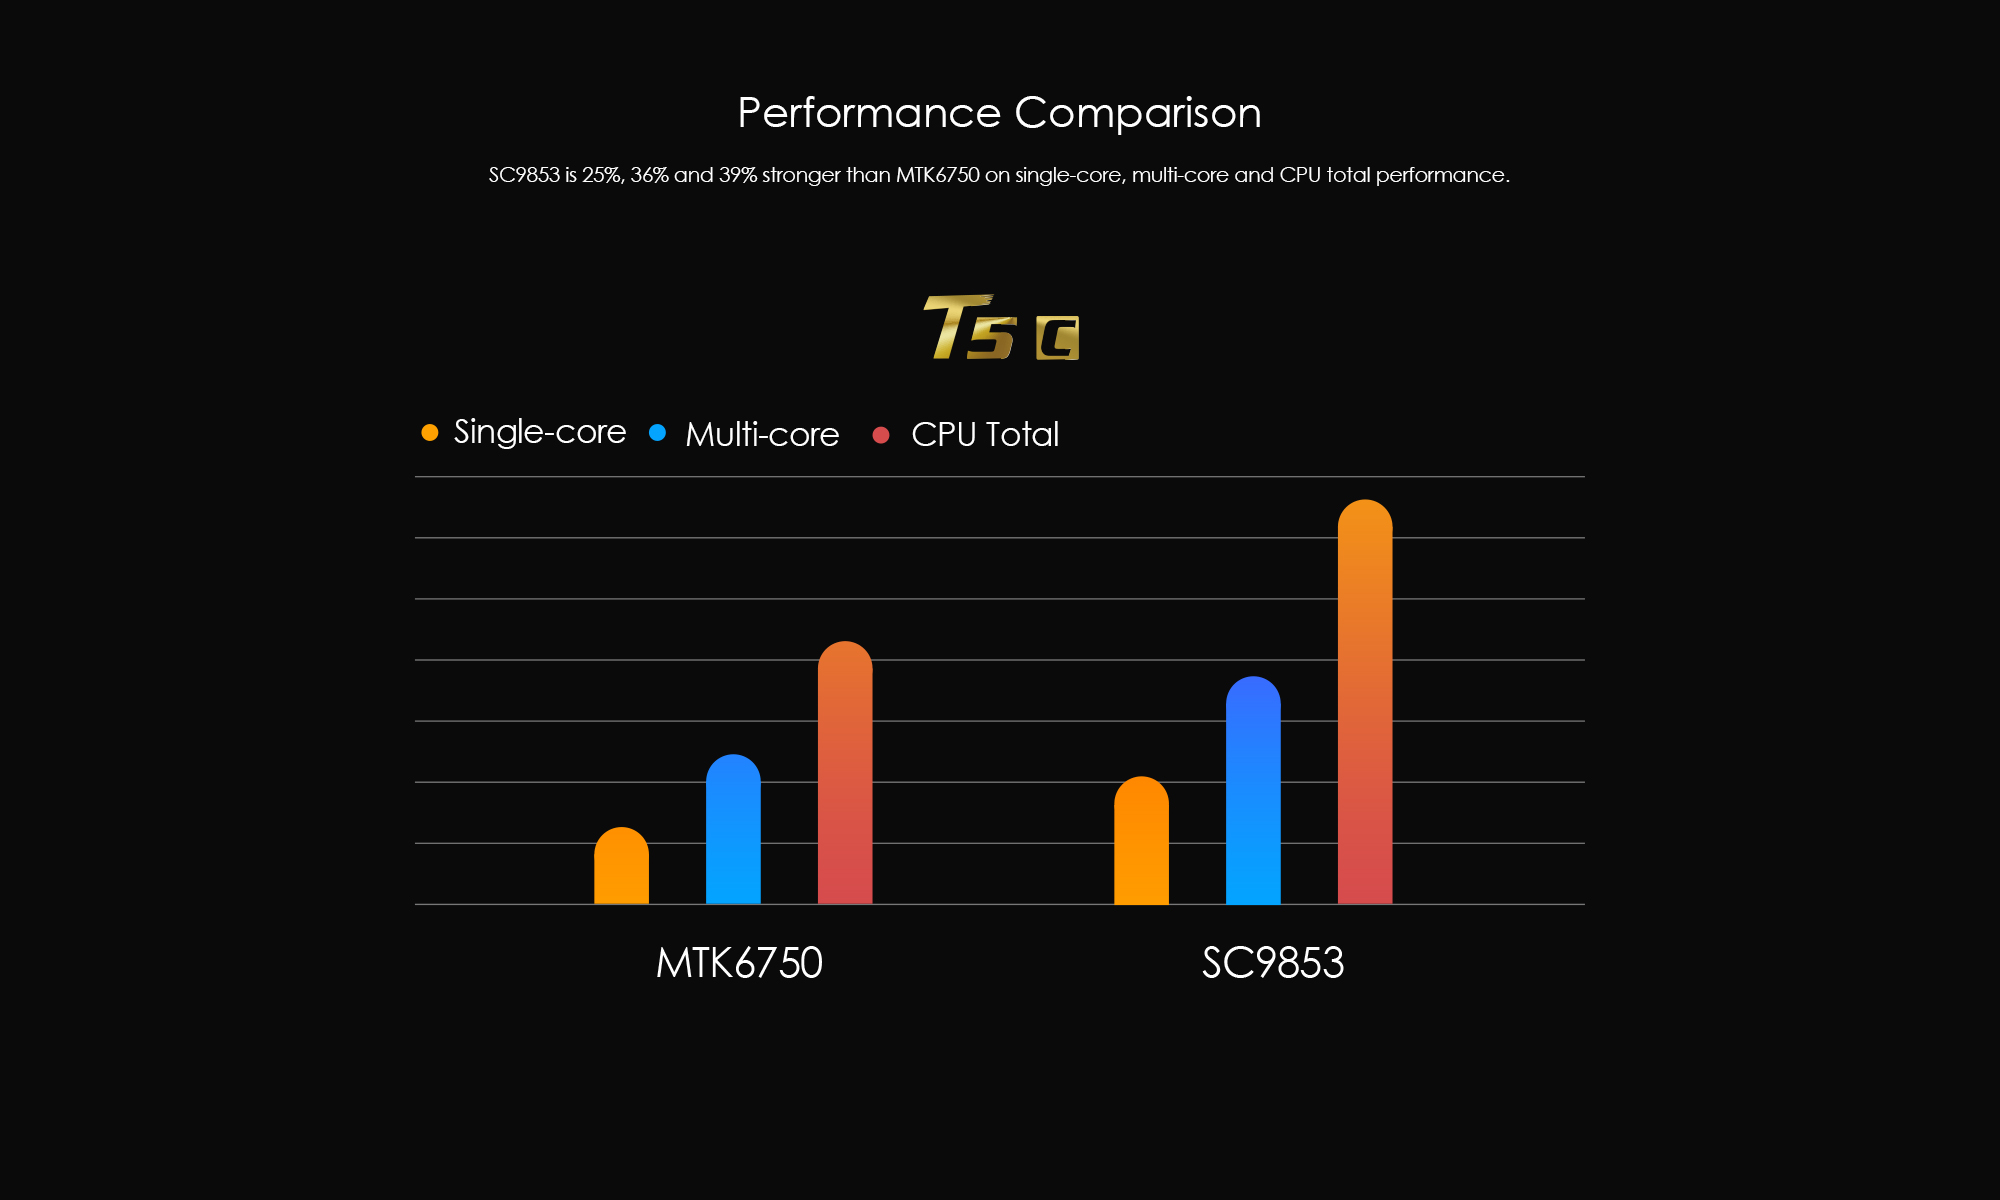 T5C-03PerformanceComparison